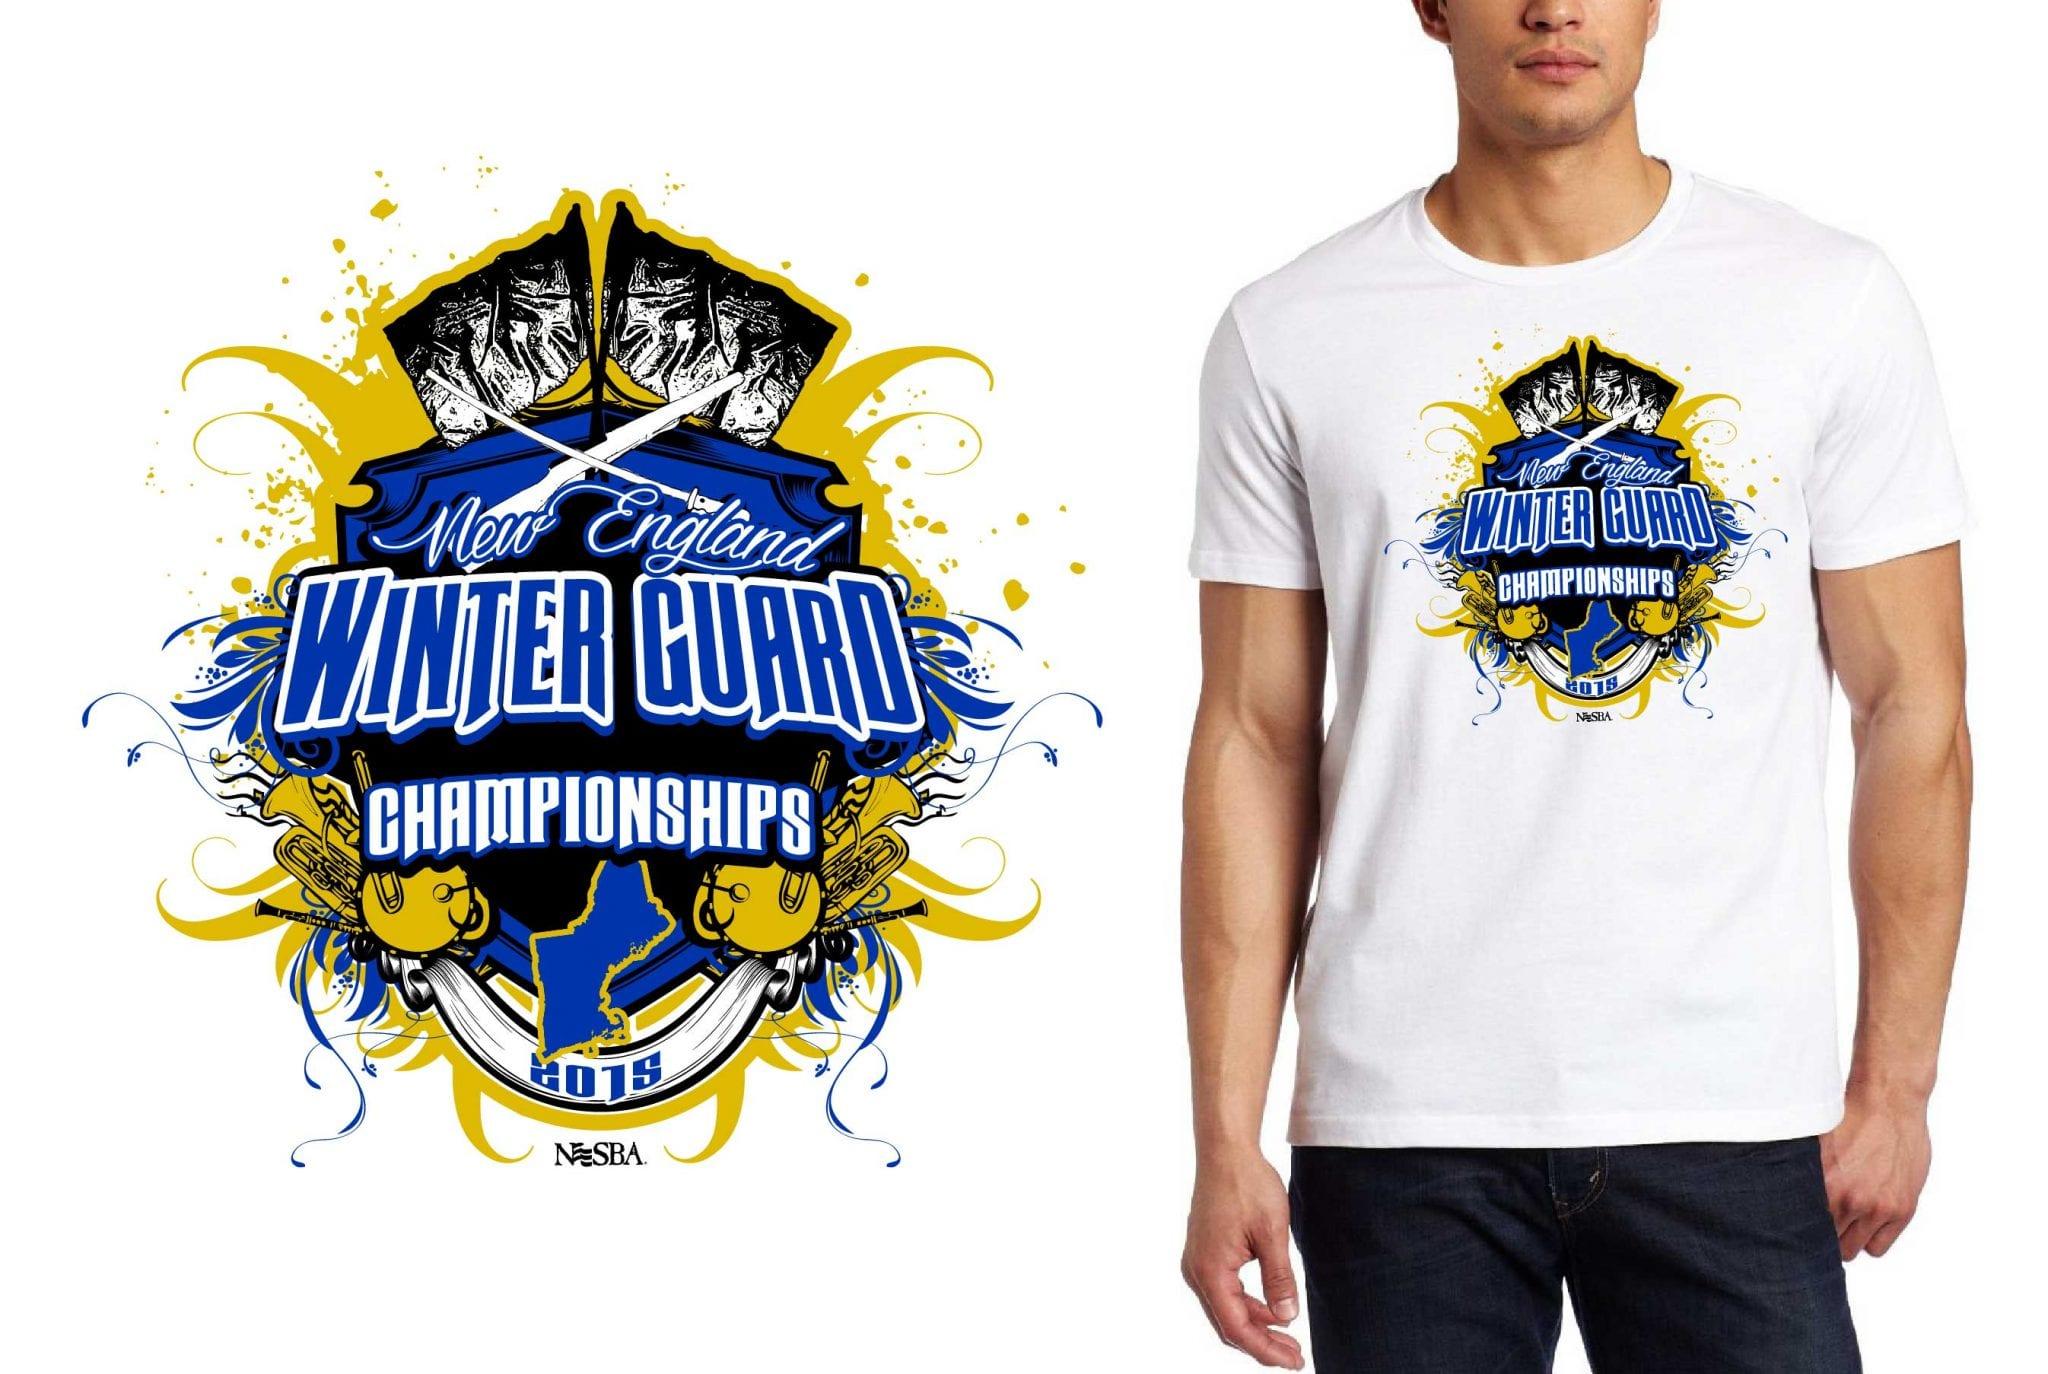 2015 New England Winter Guard Championships tshirt design